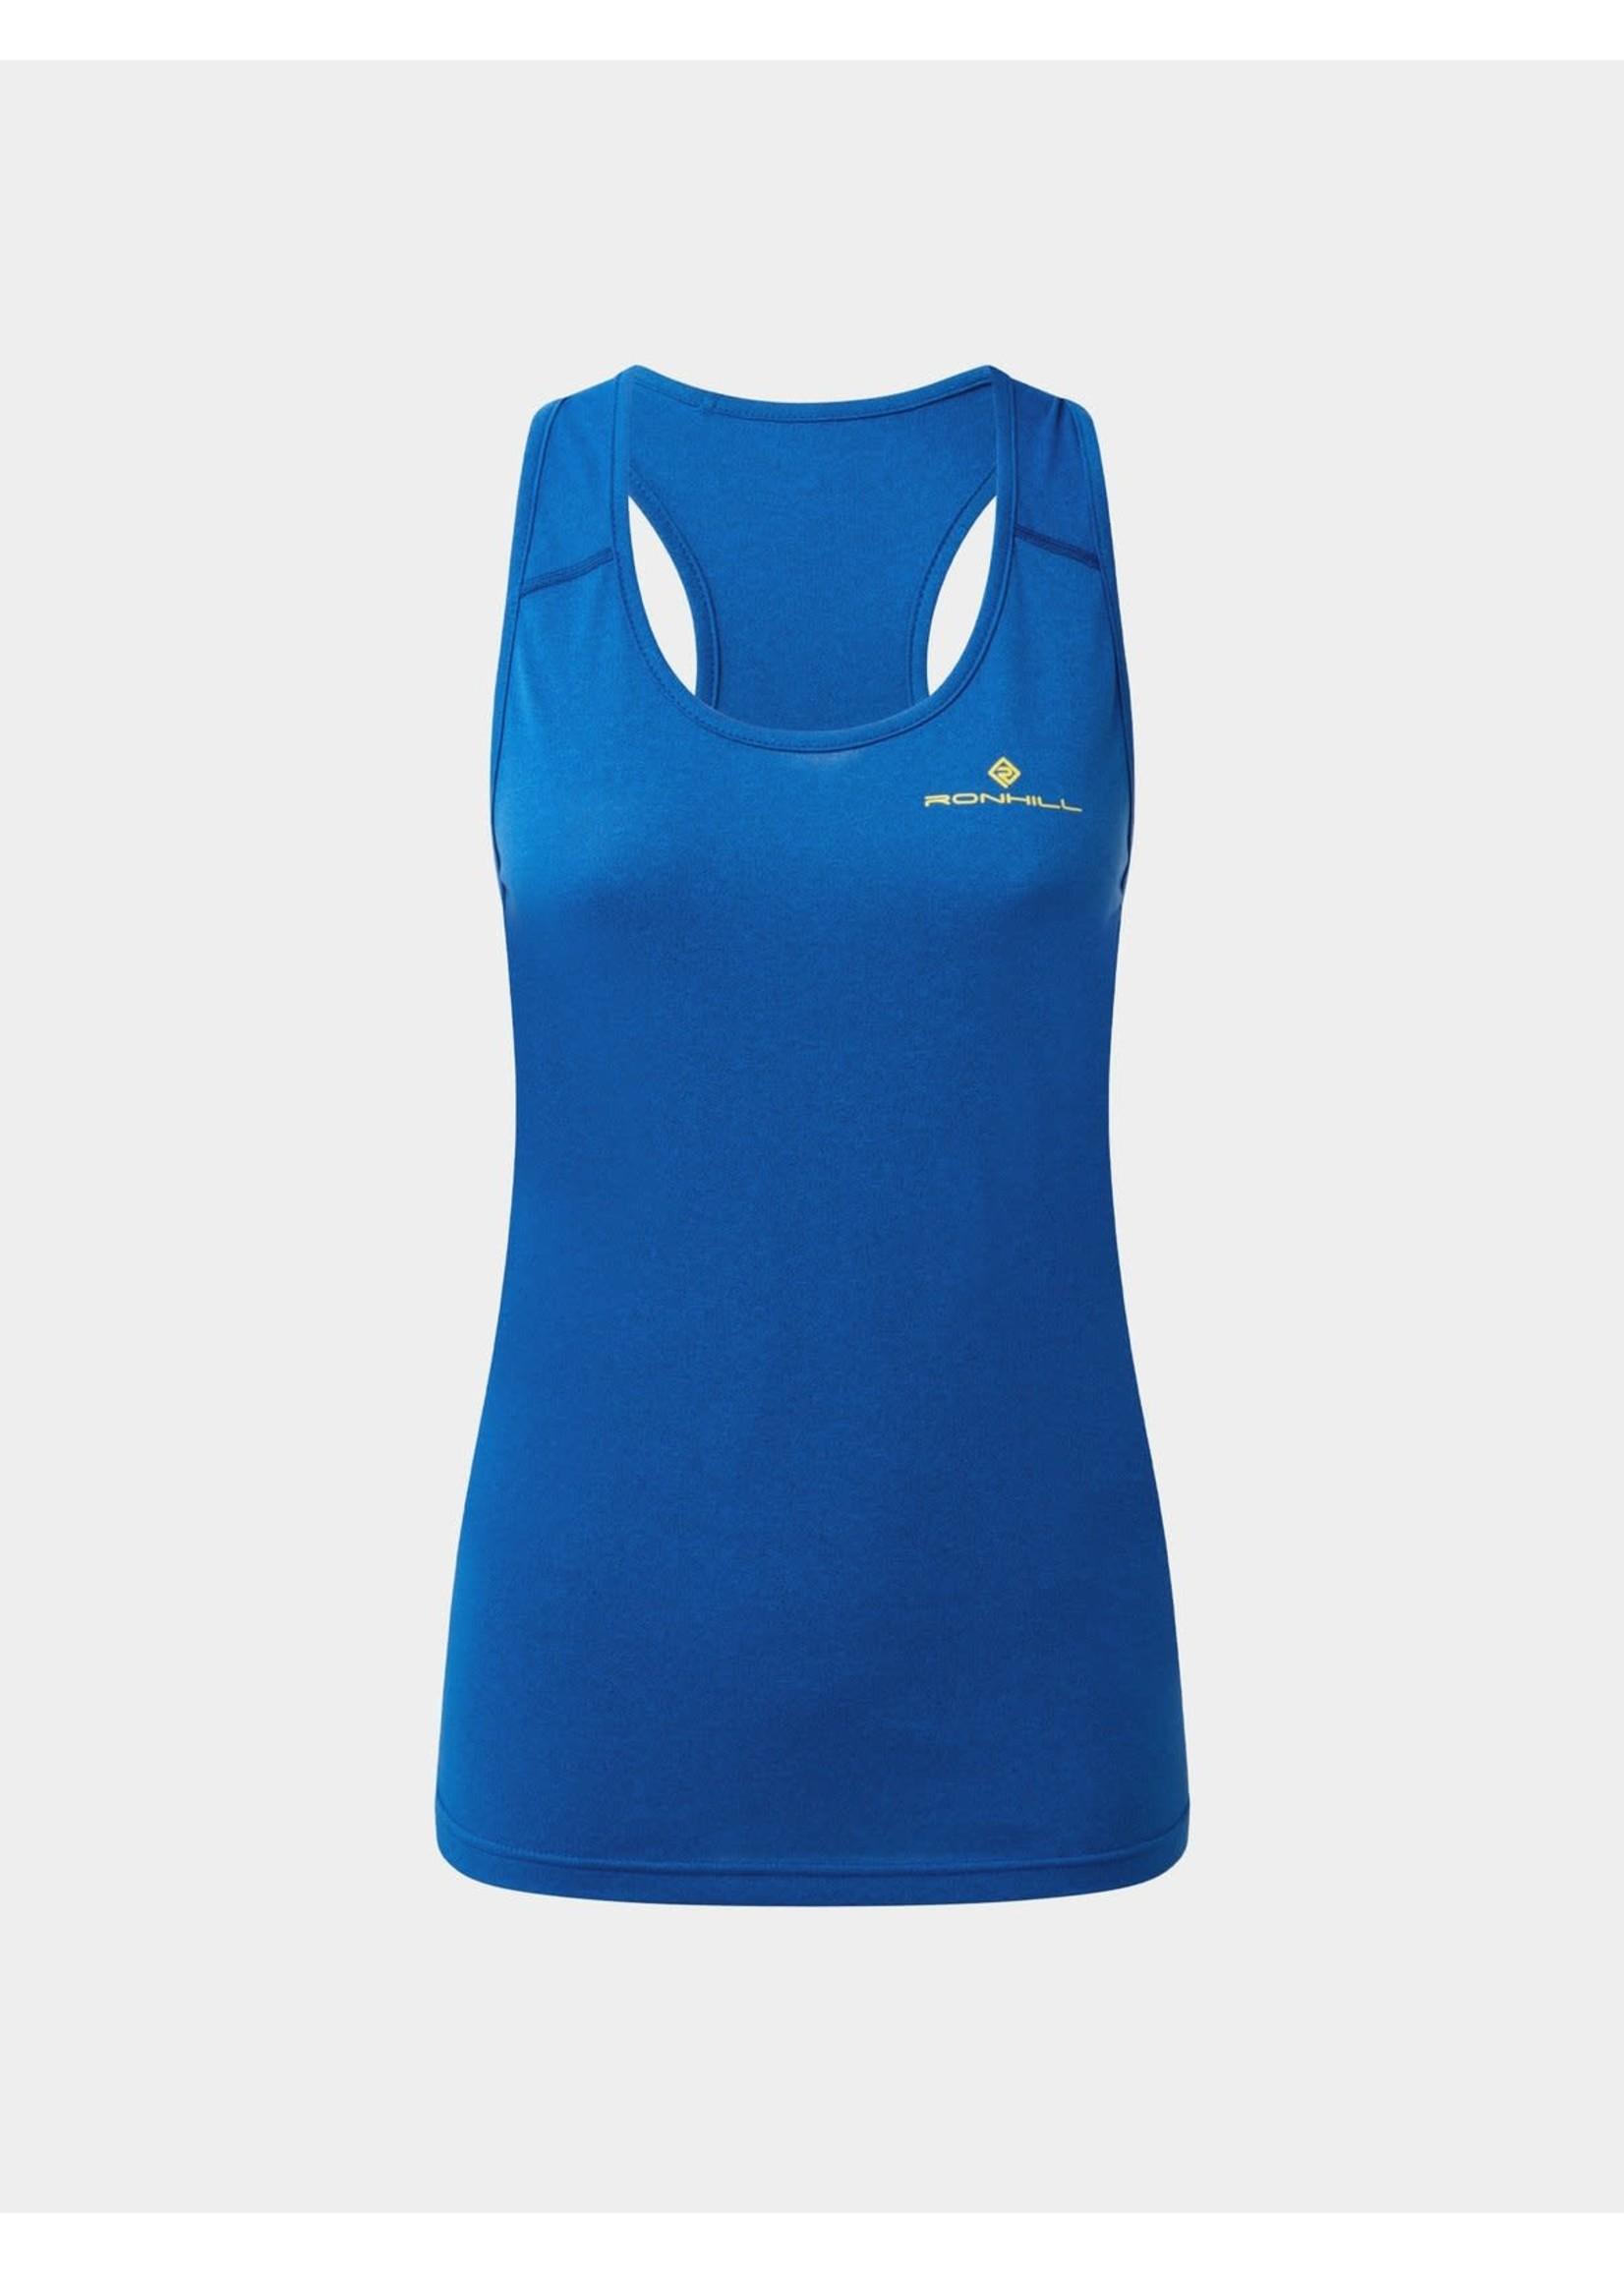 Ronhill Ron Hill Core Ladies Vest (2021) - Azurite Marl